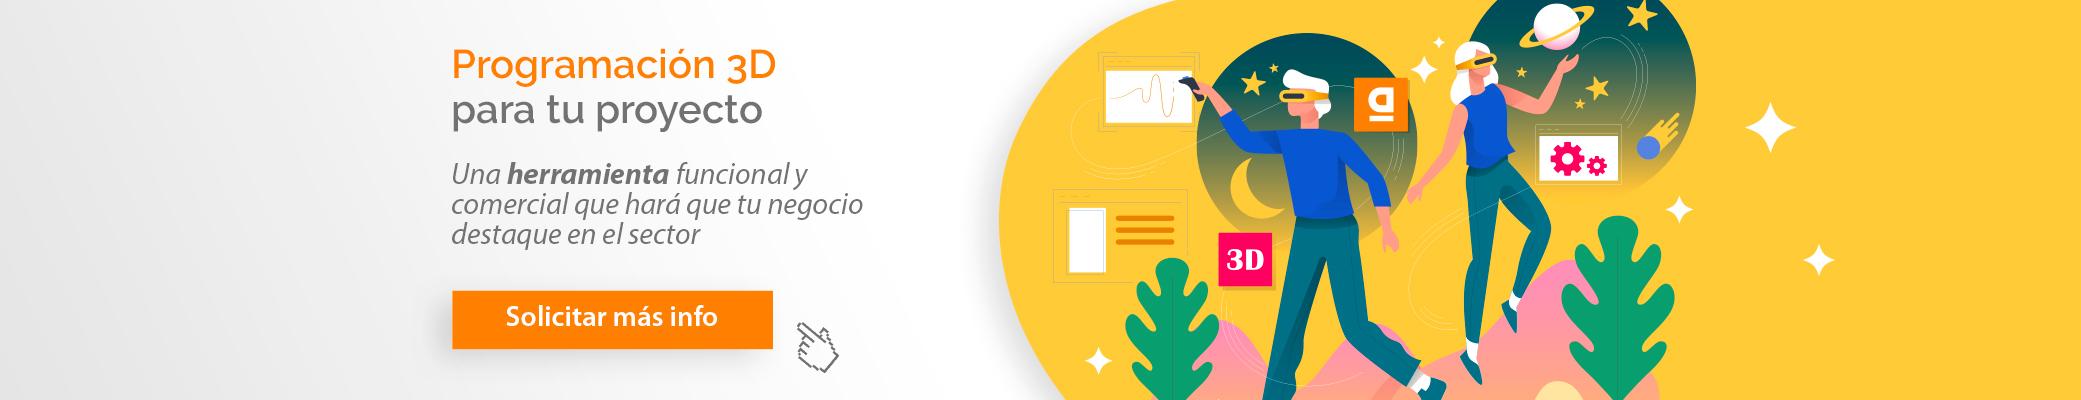 Programación en 3D para tu proyecto